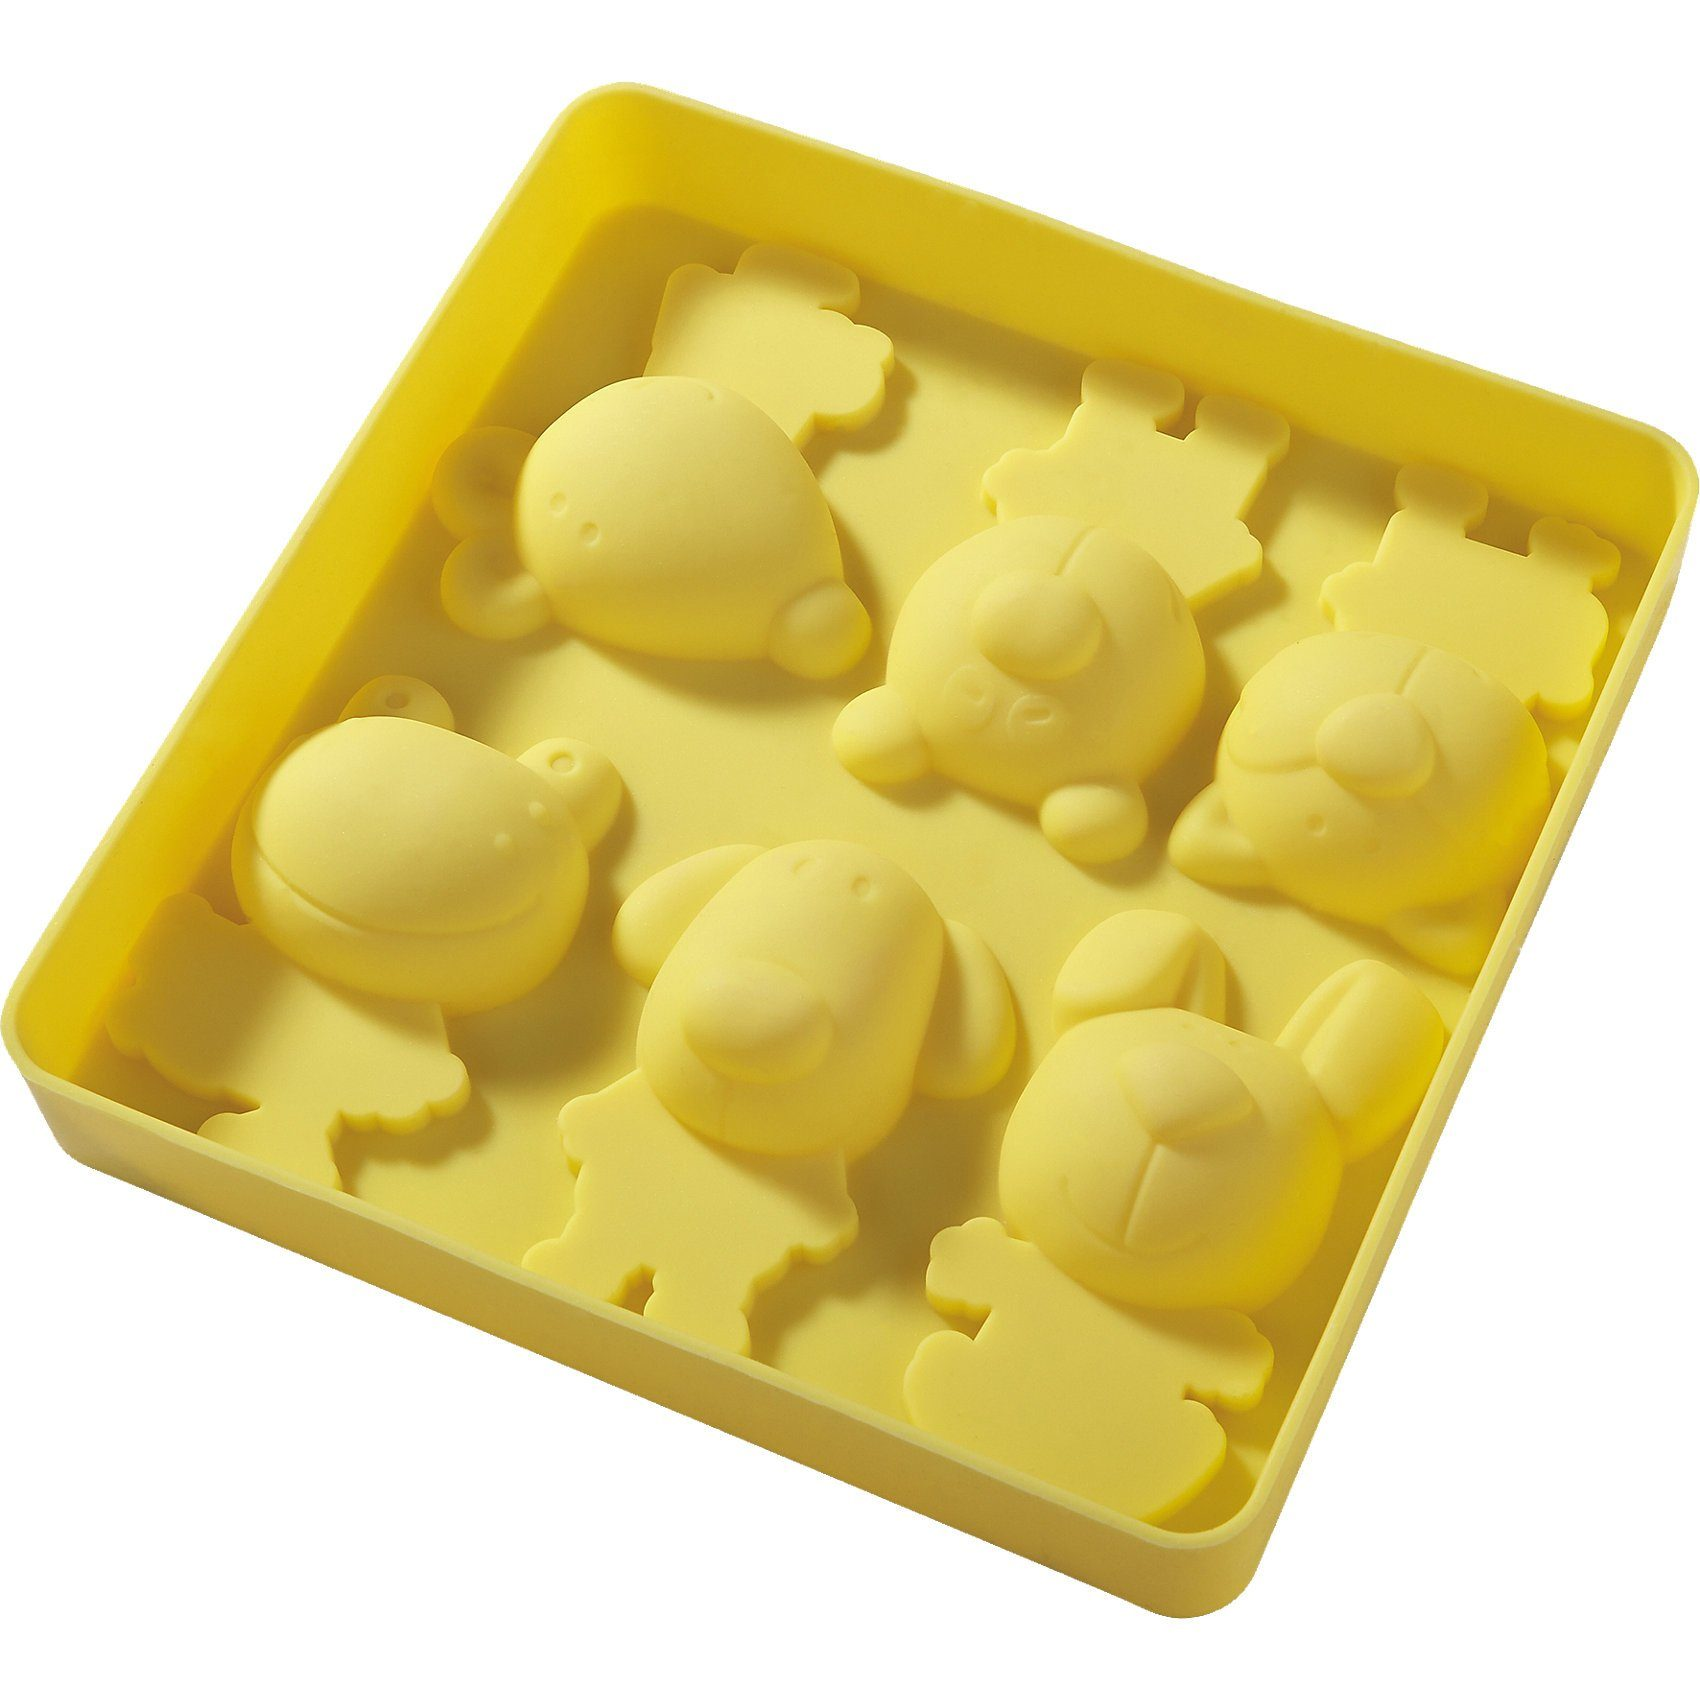 Haba Silikon-Eisform Süße Freunde